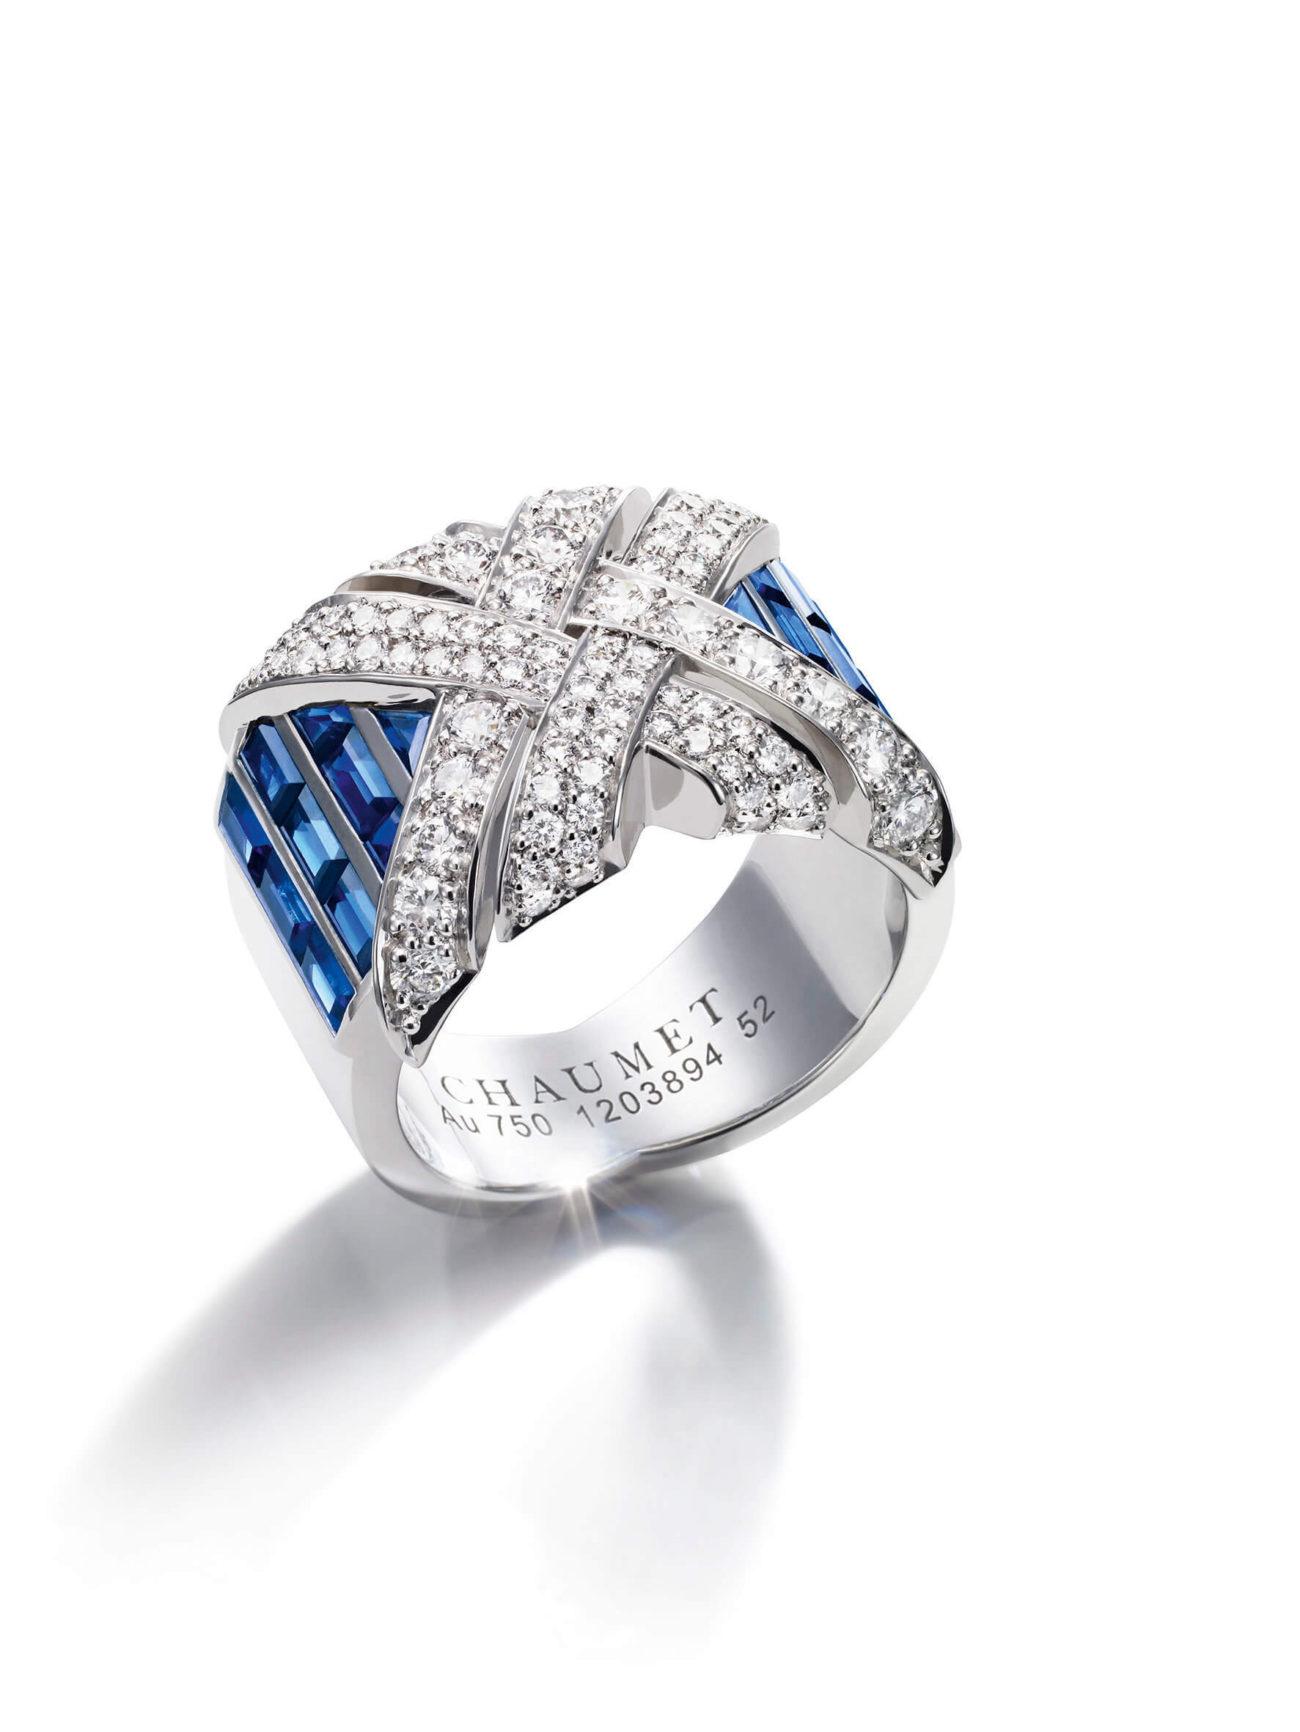 74adee647800 Anillos de segunda mano  ¿dónde comprar un anillo Chaumet barato ...